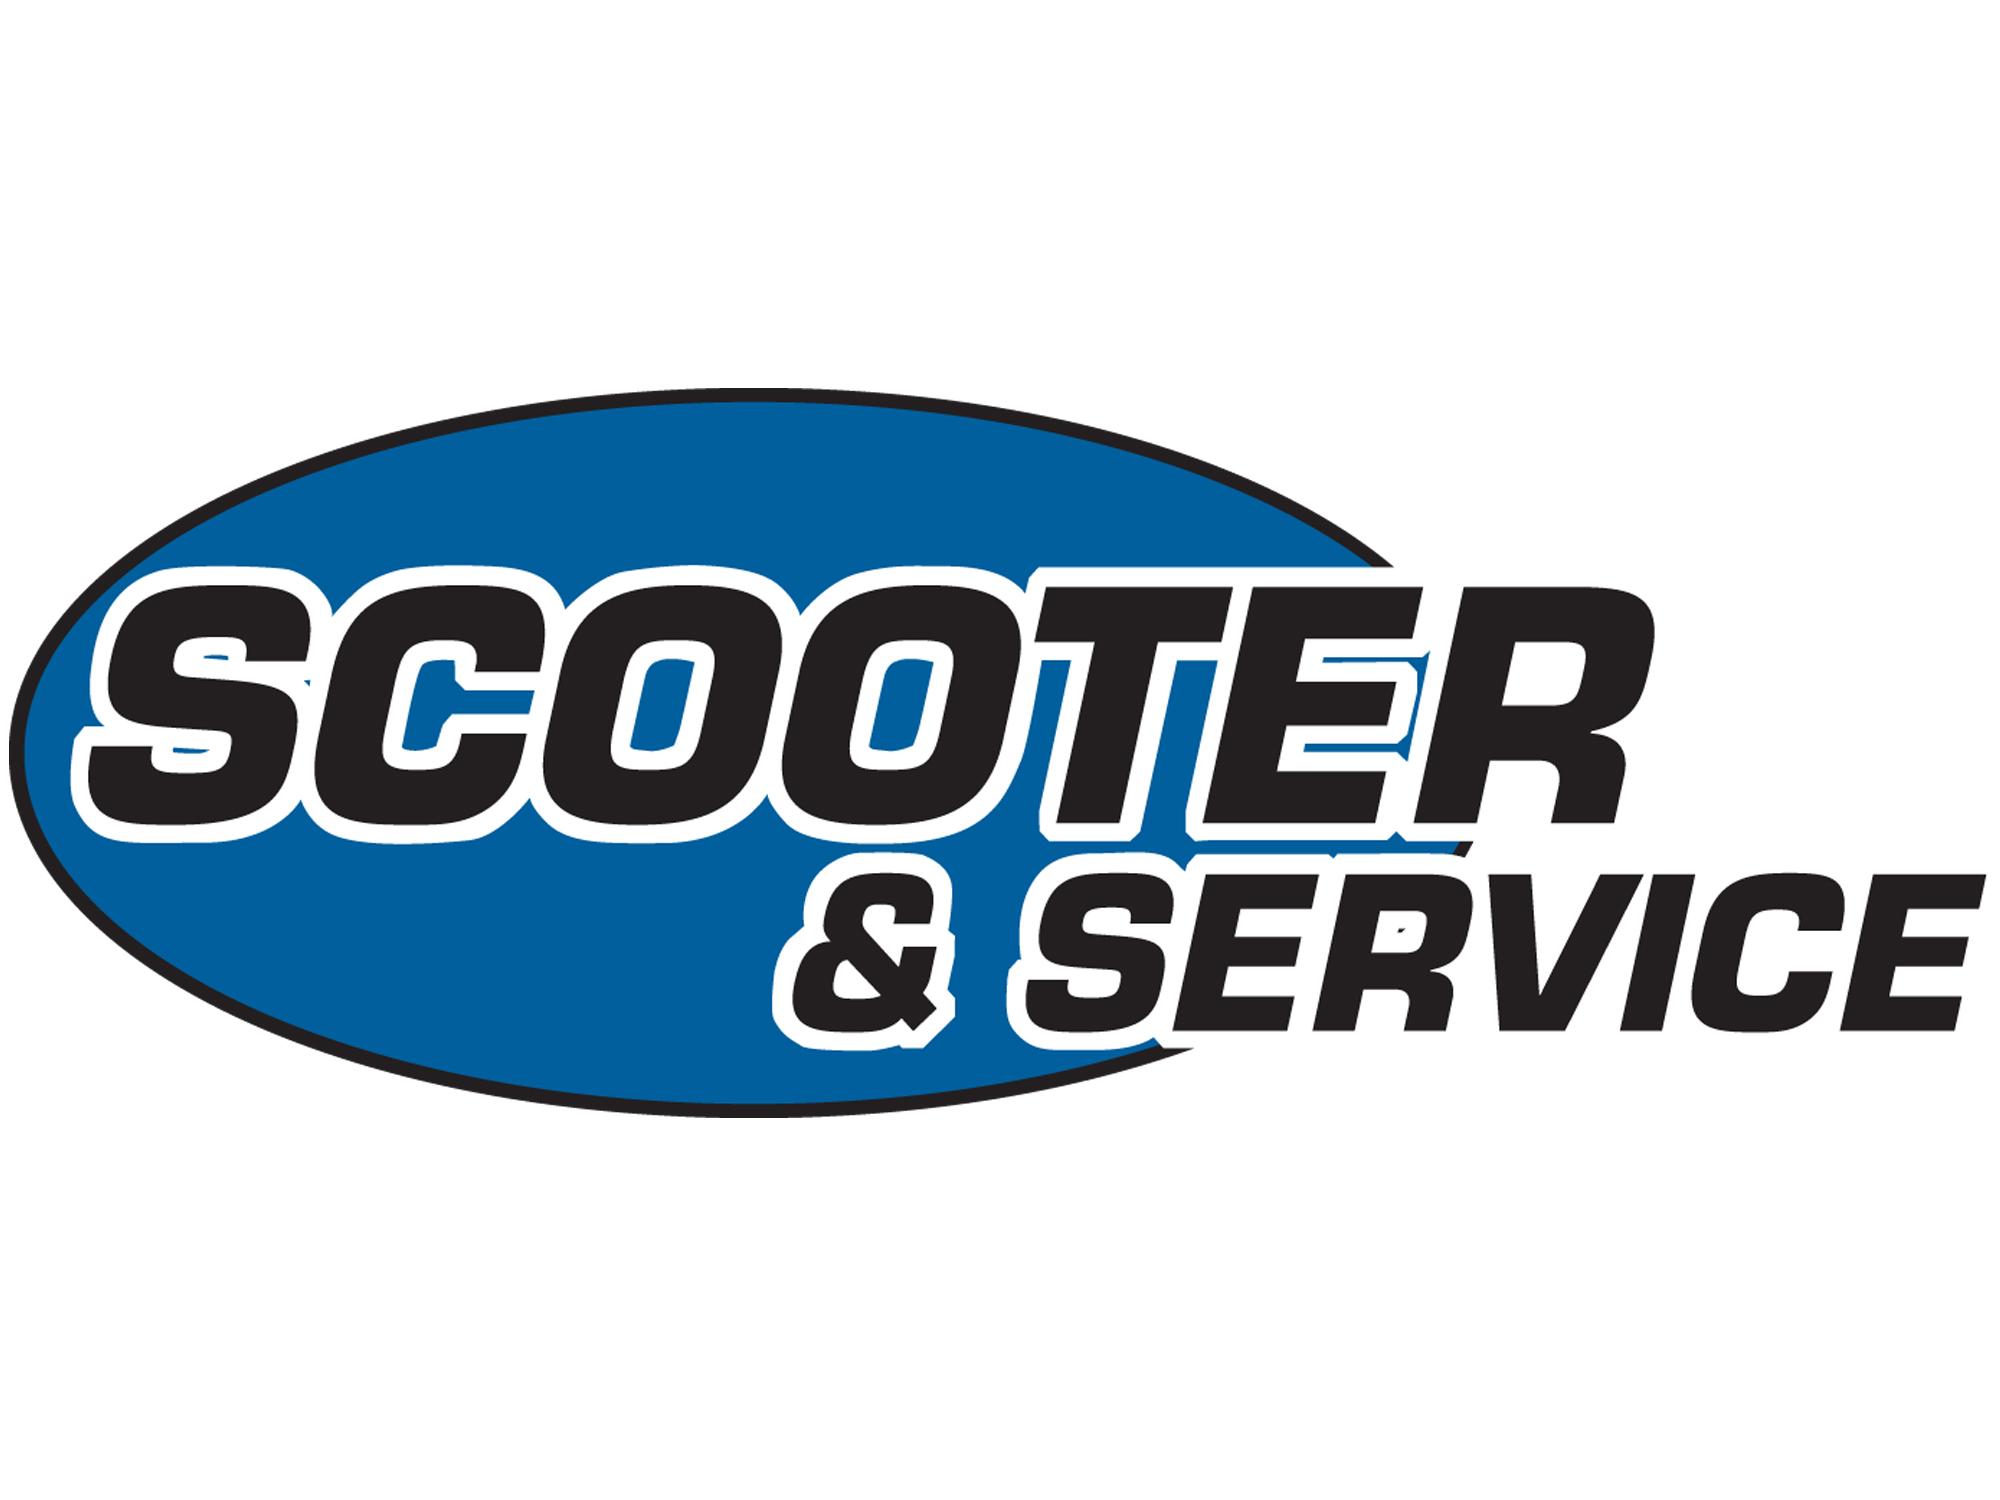 scooter service scooter service. Black Bedroom Furniture Sets. Home Design Ideas